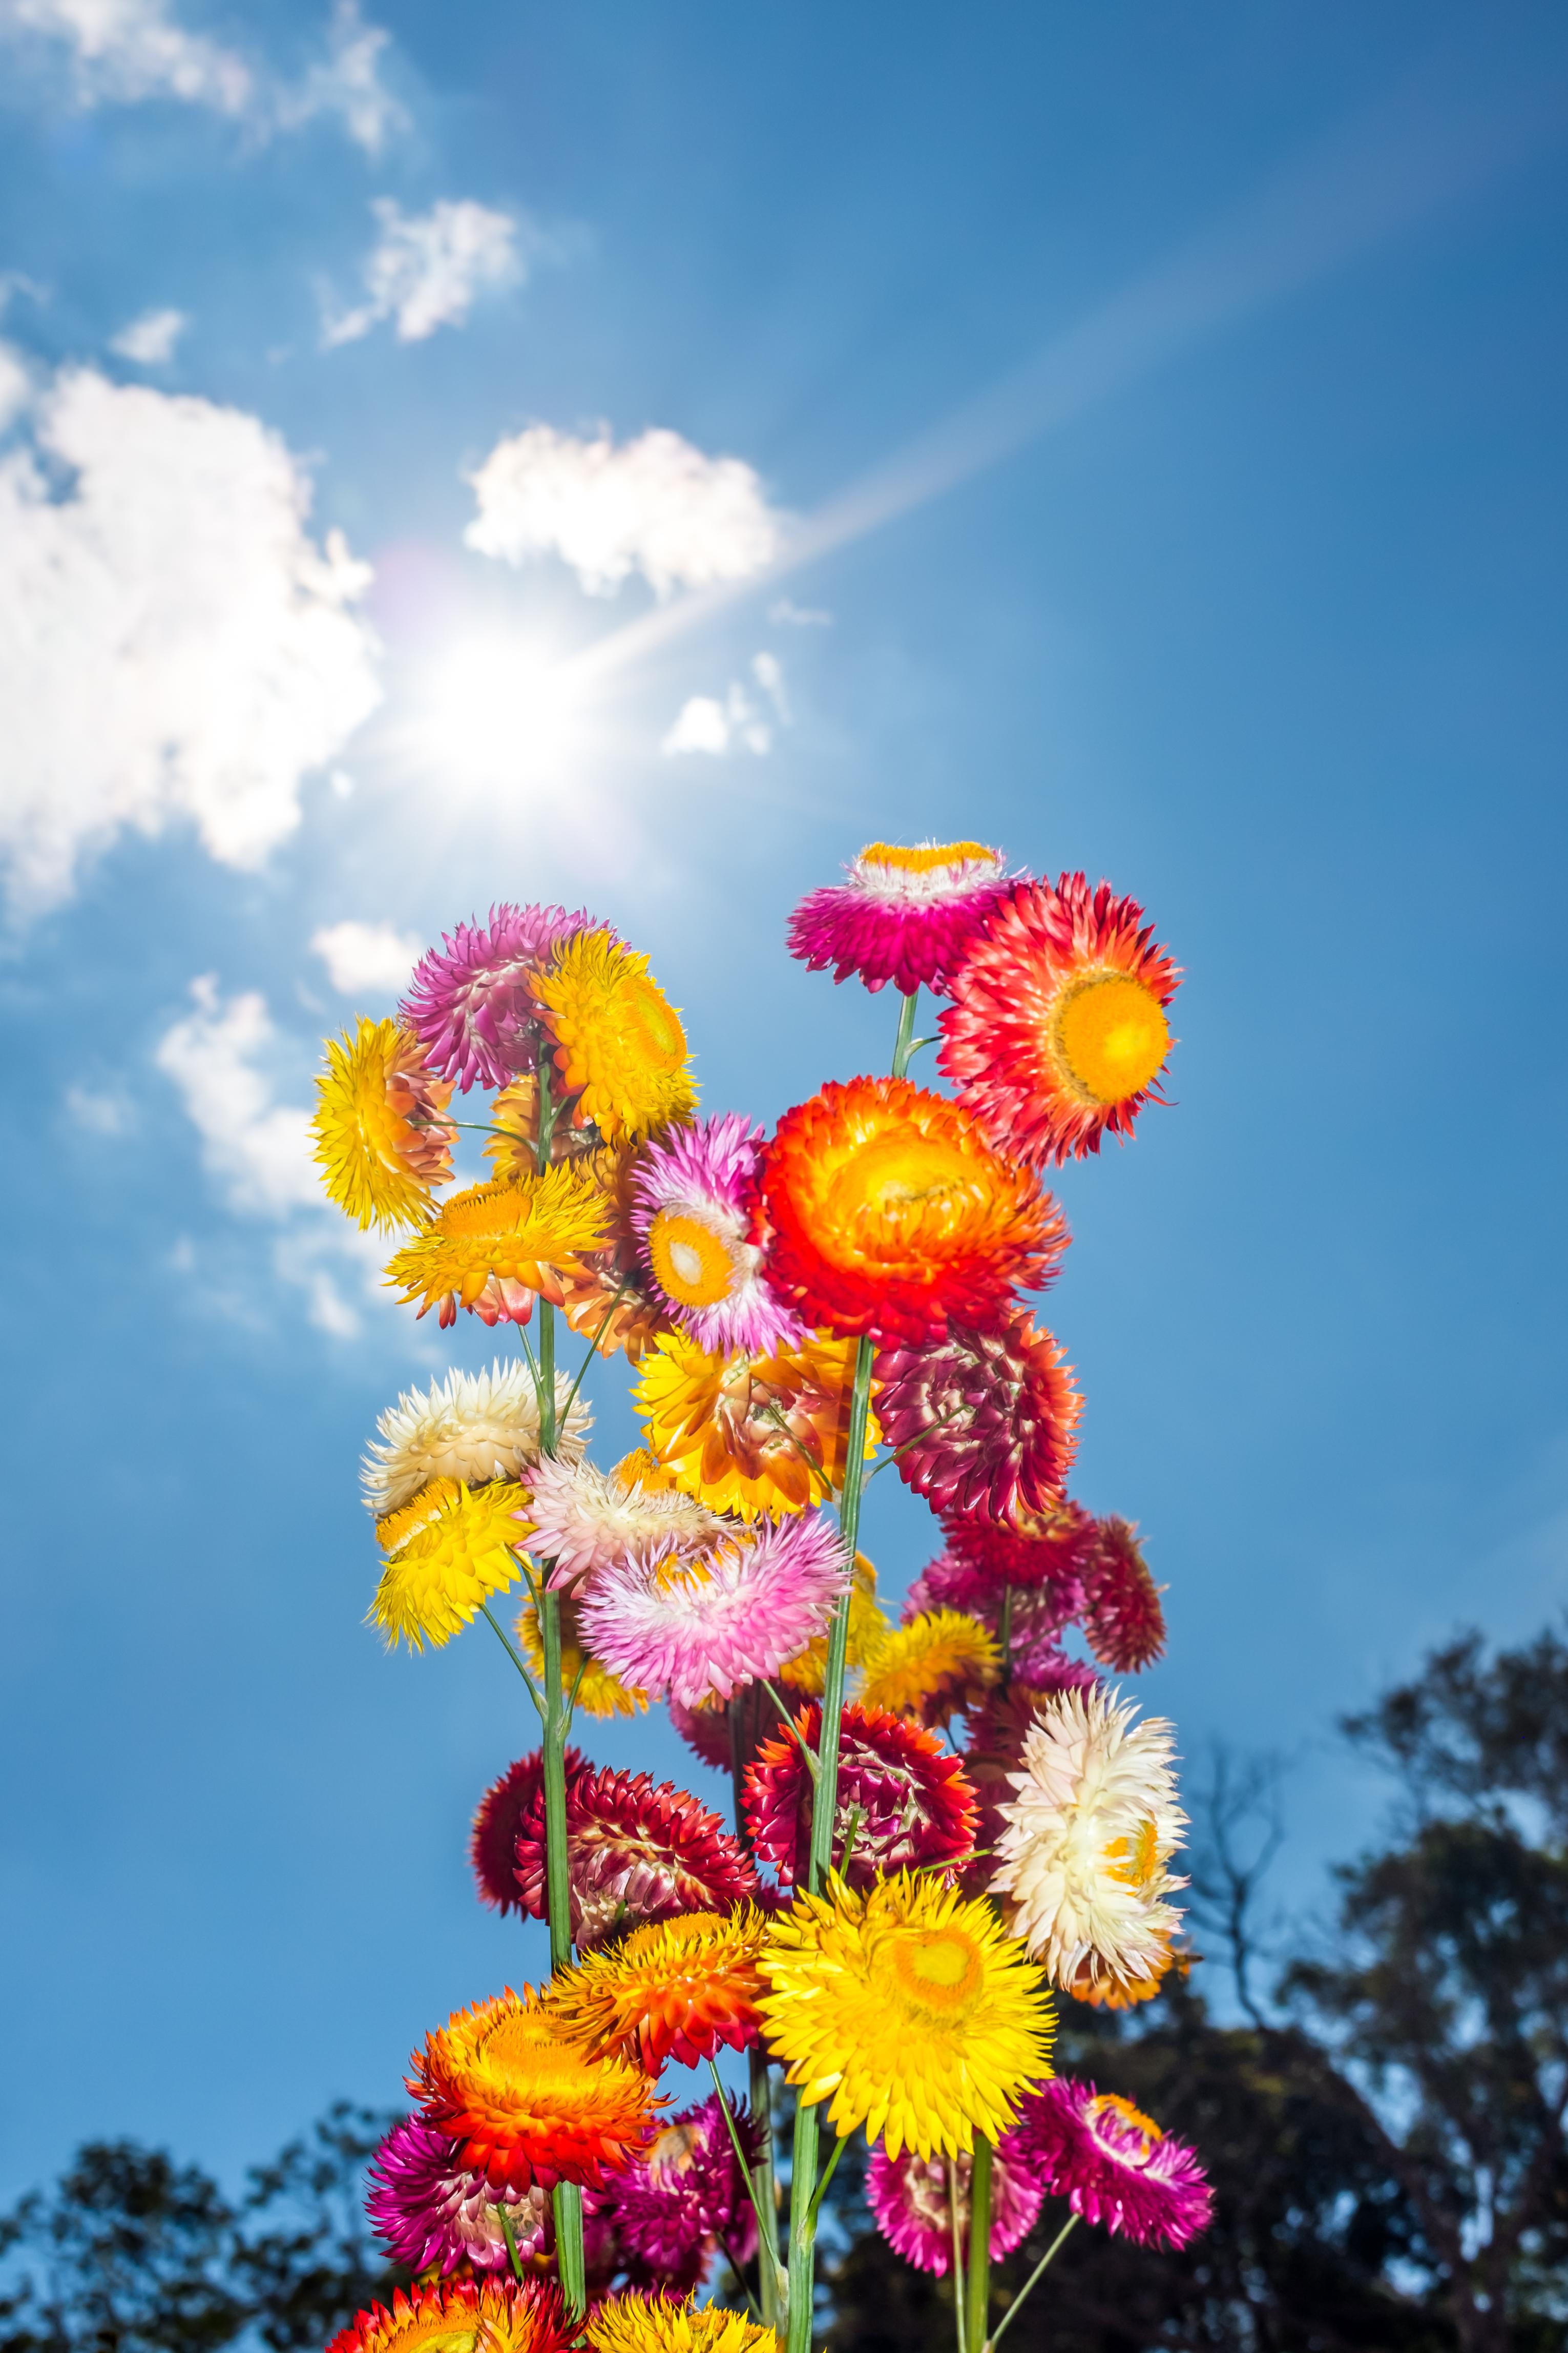 4 Everlasting Flower (Helichrysum Bracteatum)